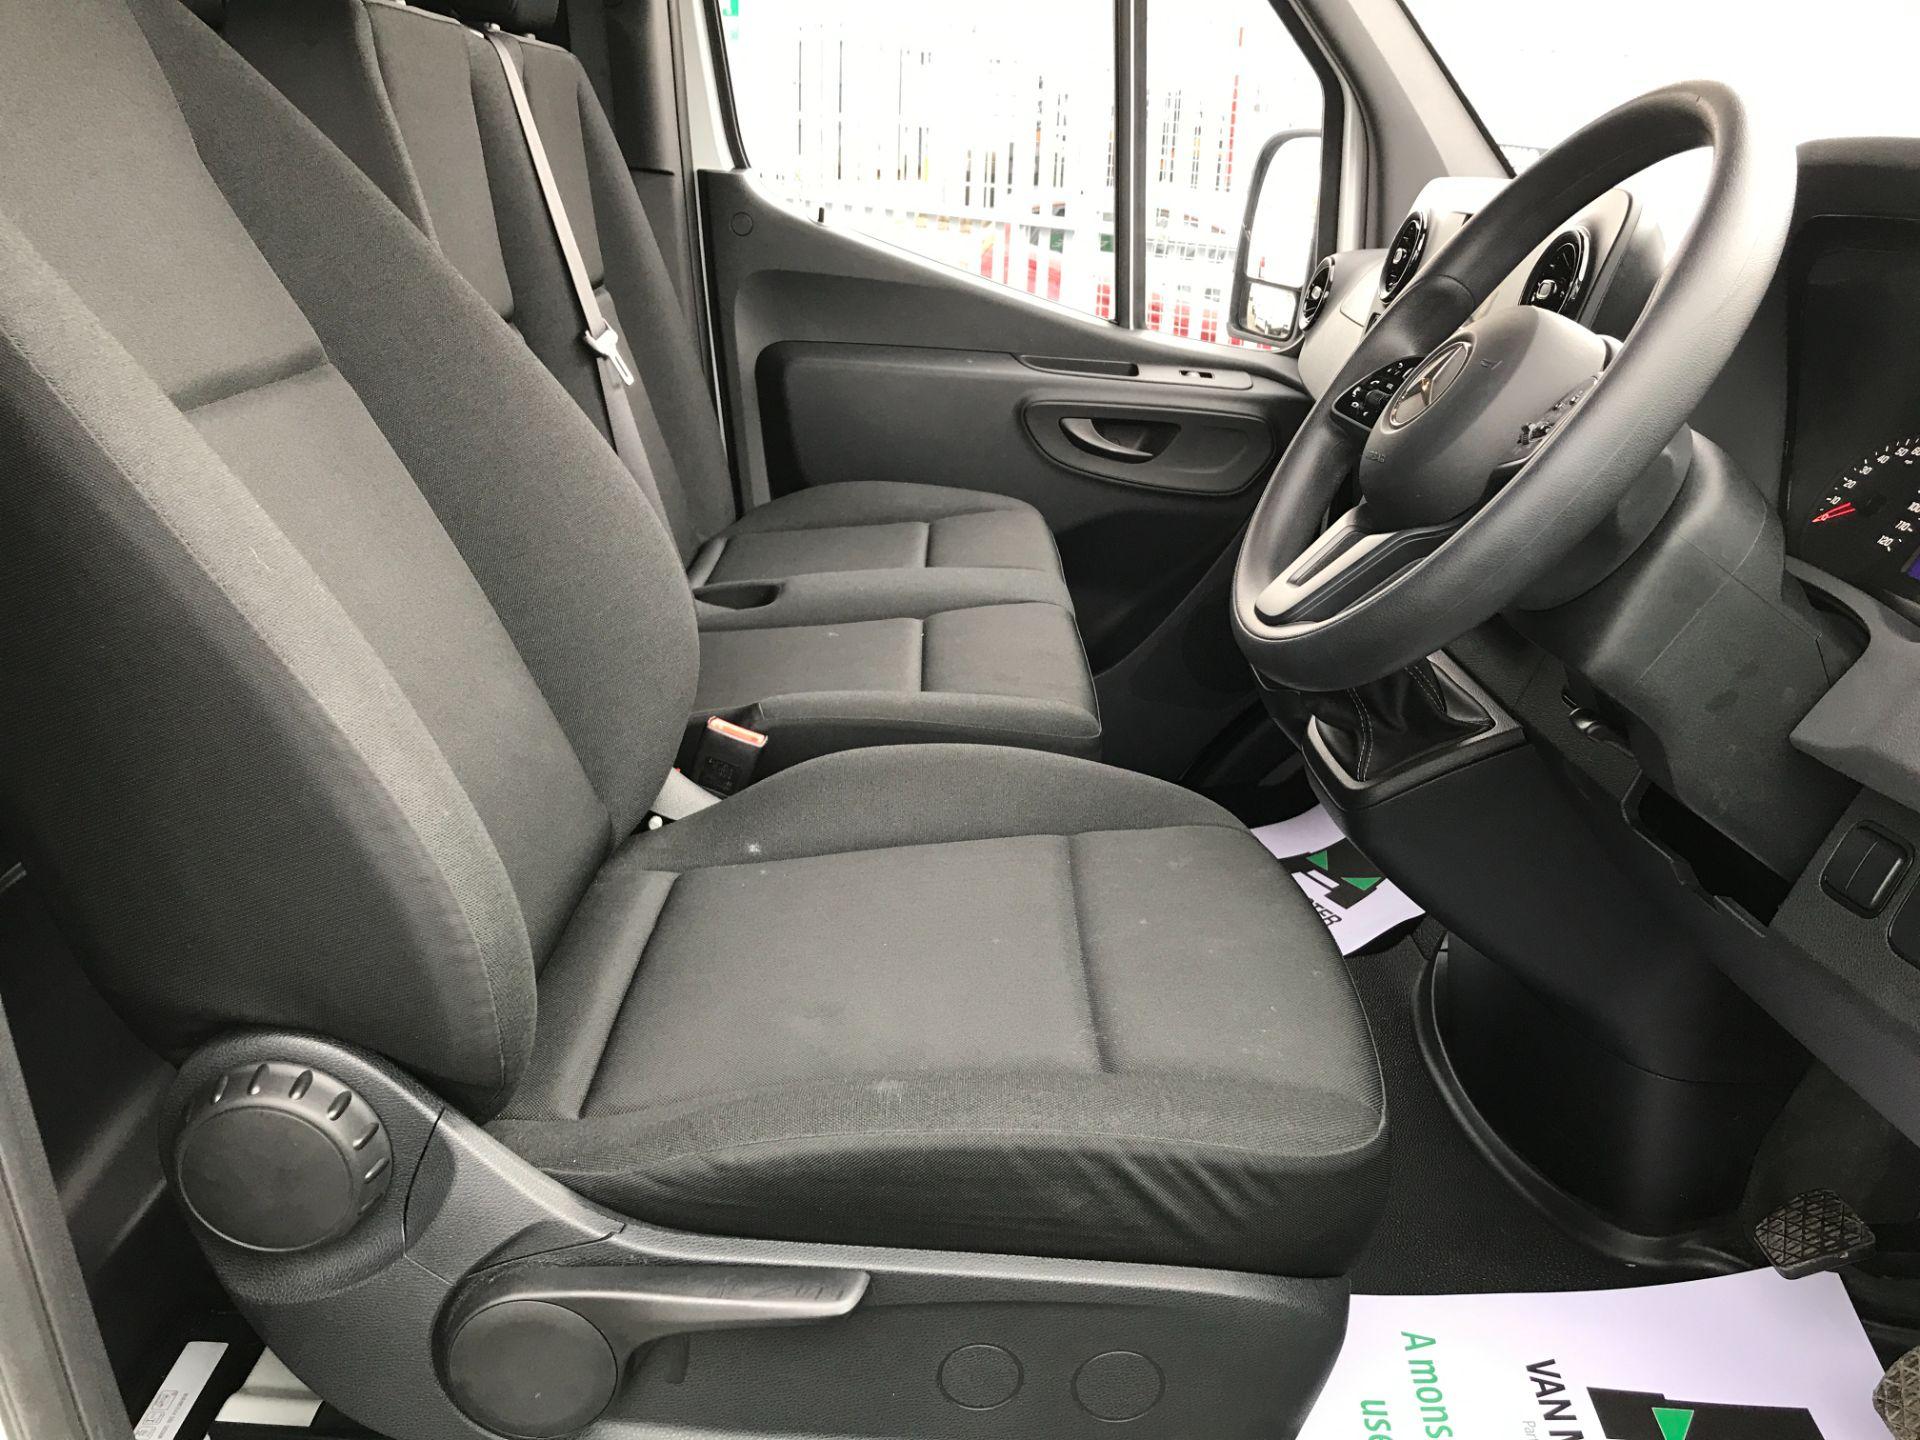 2019 Mercedes-Benz Sprinter 314CDI L2 H2 140PS FWD EURO 6 (KM19BPL) Image 14